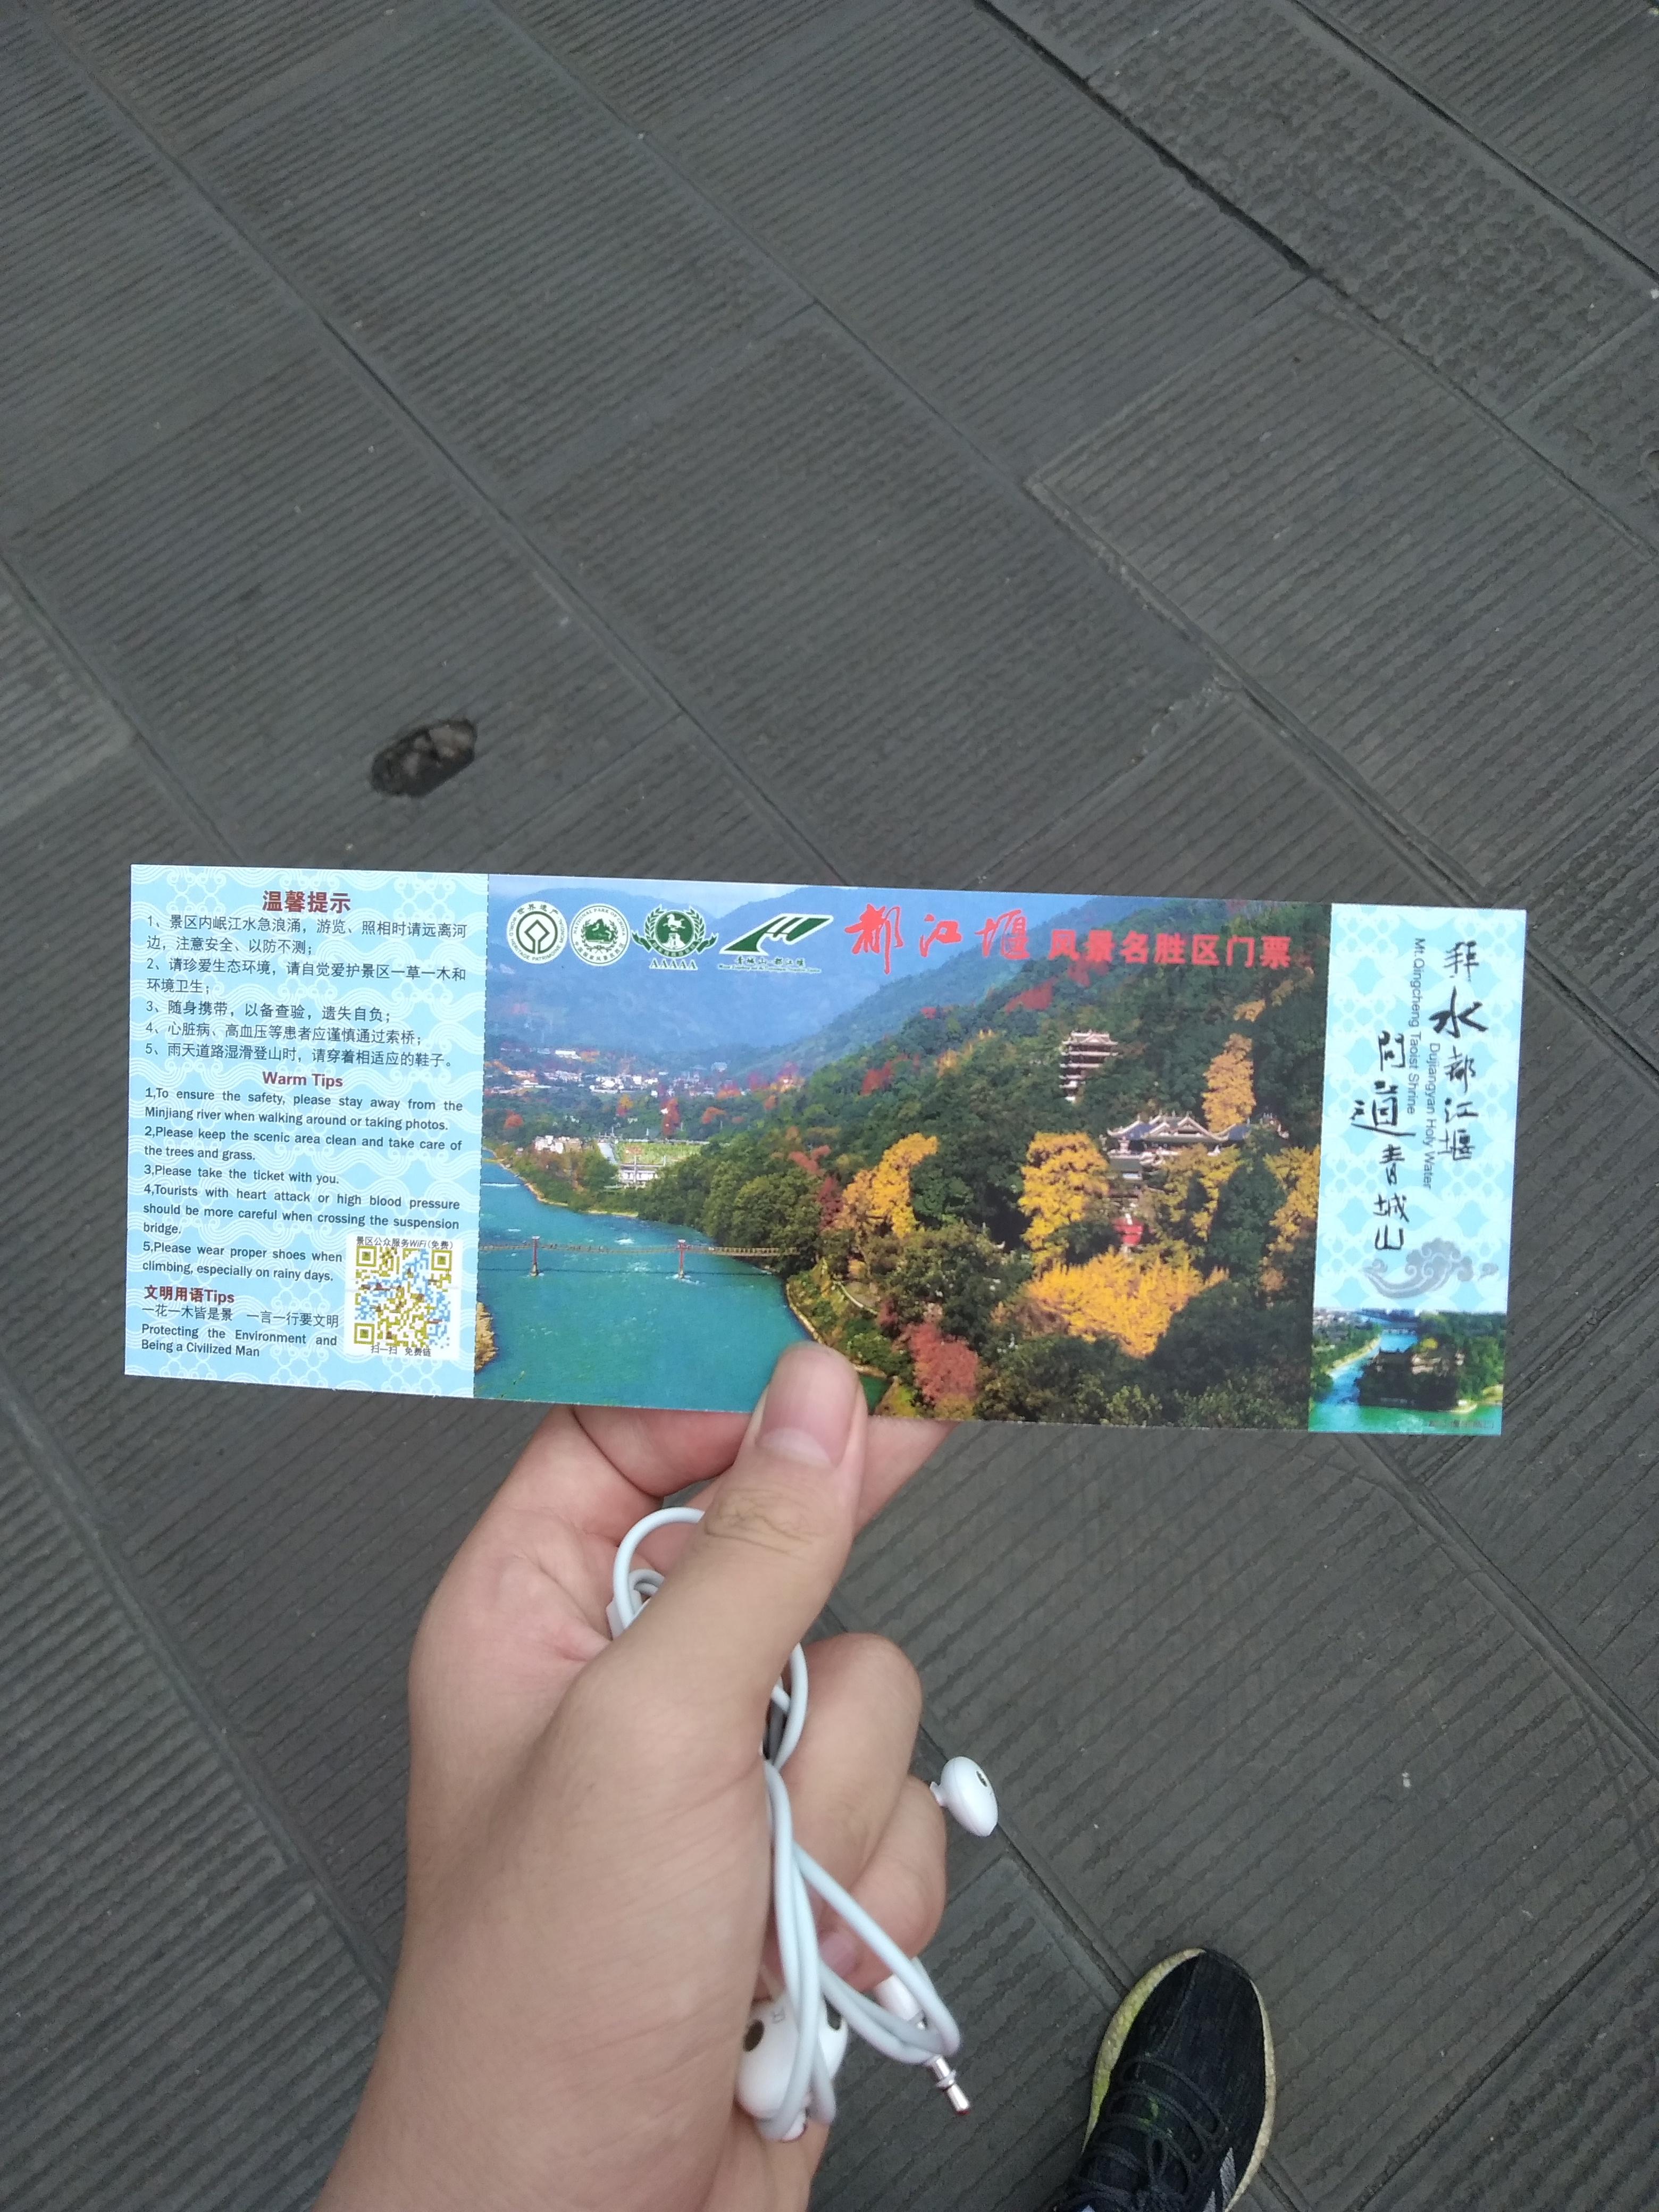 #5 LiDui Park Trip 1.